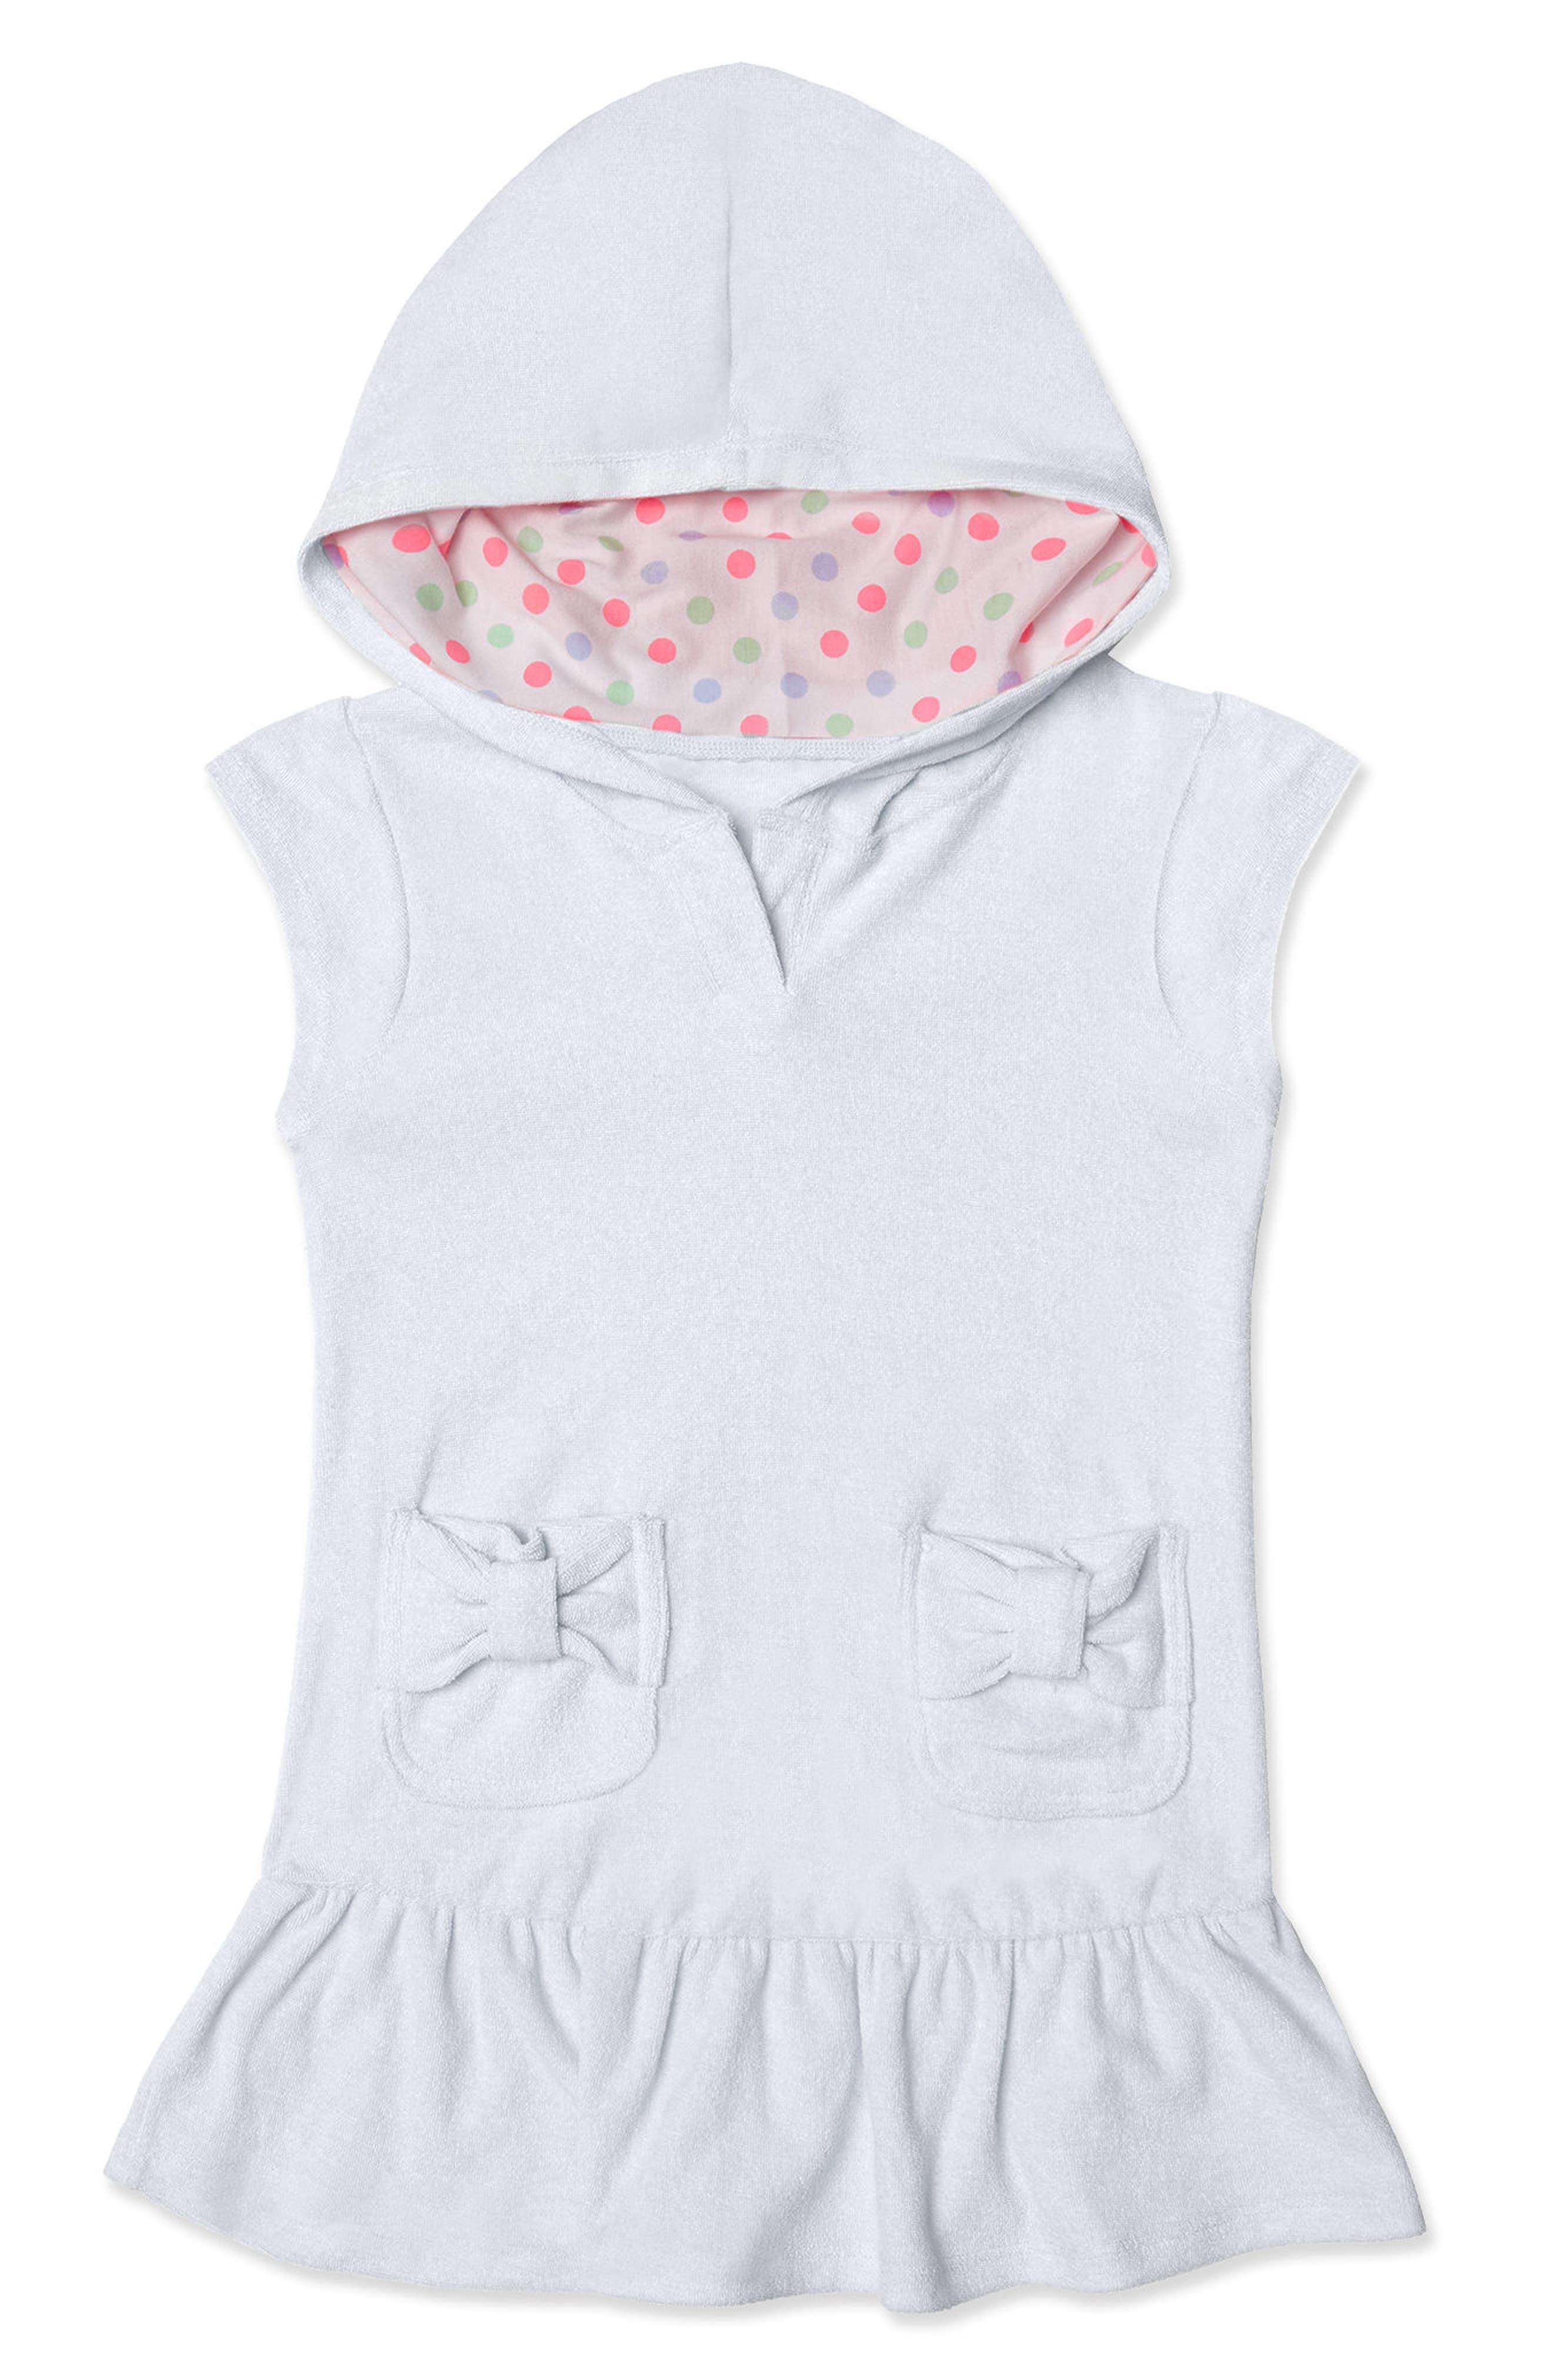 Hula Star Cotton Cloud Hooded Cover-Up Dress (Toddler Girls & Little Girls)